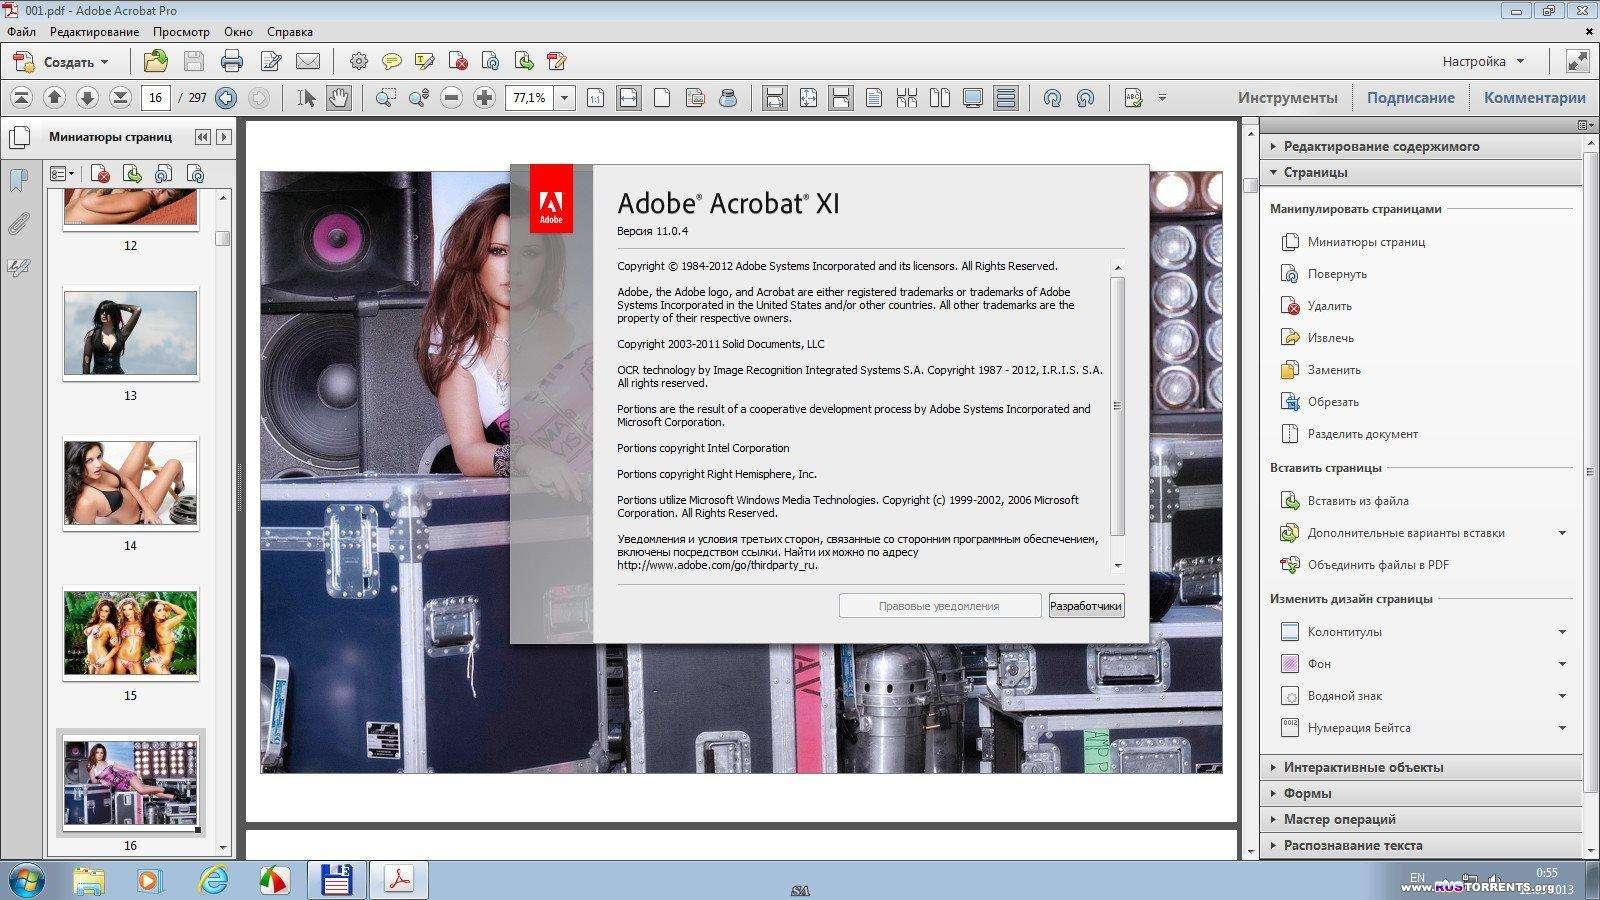 Adobe Acrobat XI Pro 11.0.4 RePack by KpoJIuK (Multi/Rus)